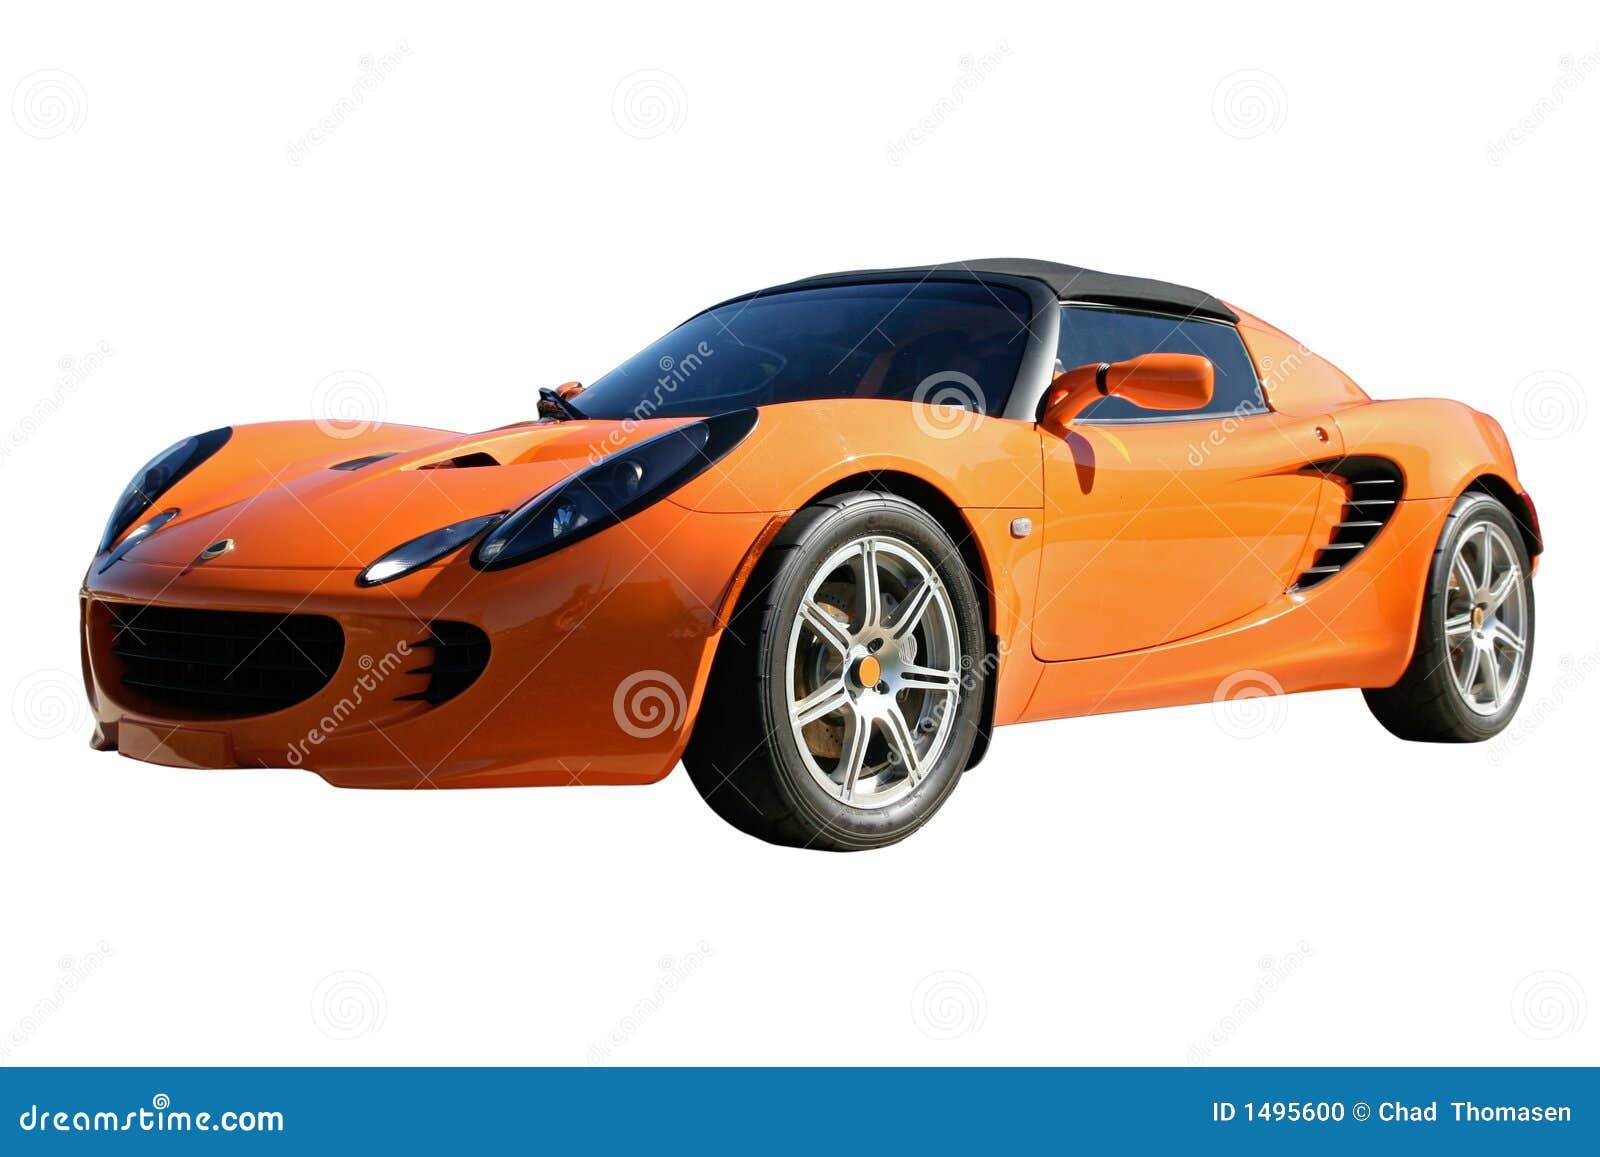 voiture de sport orange photo stock image du chaud chemin 1495600. Black Bedroom Furniture Sets. Home Design Ideas